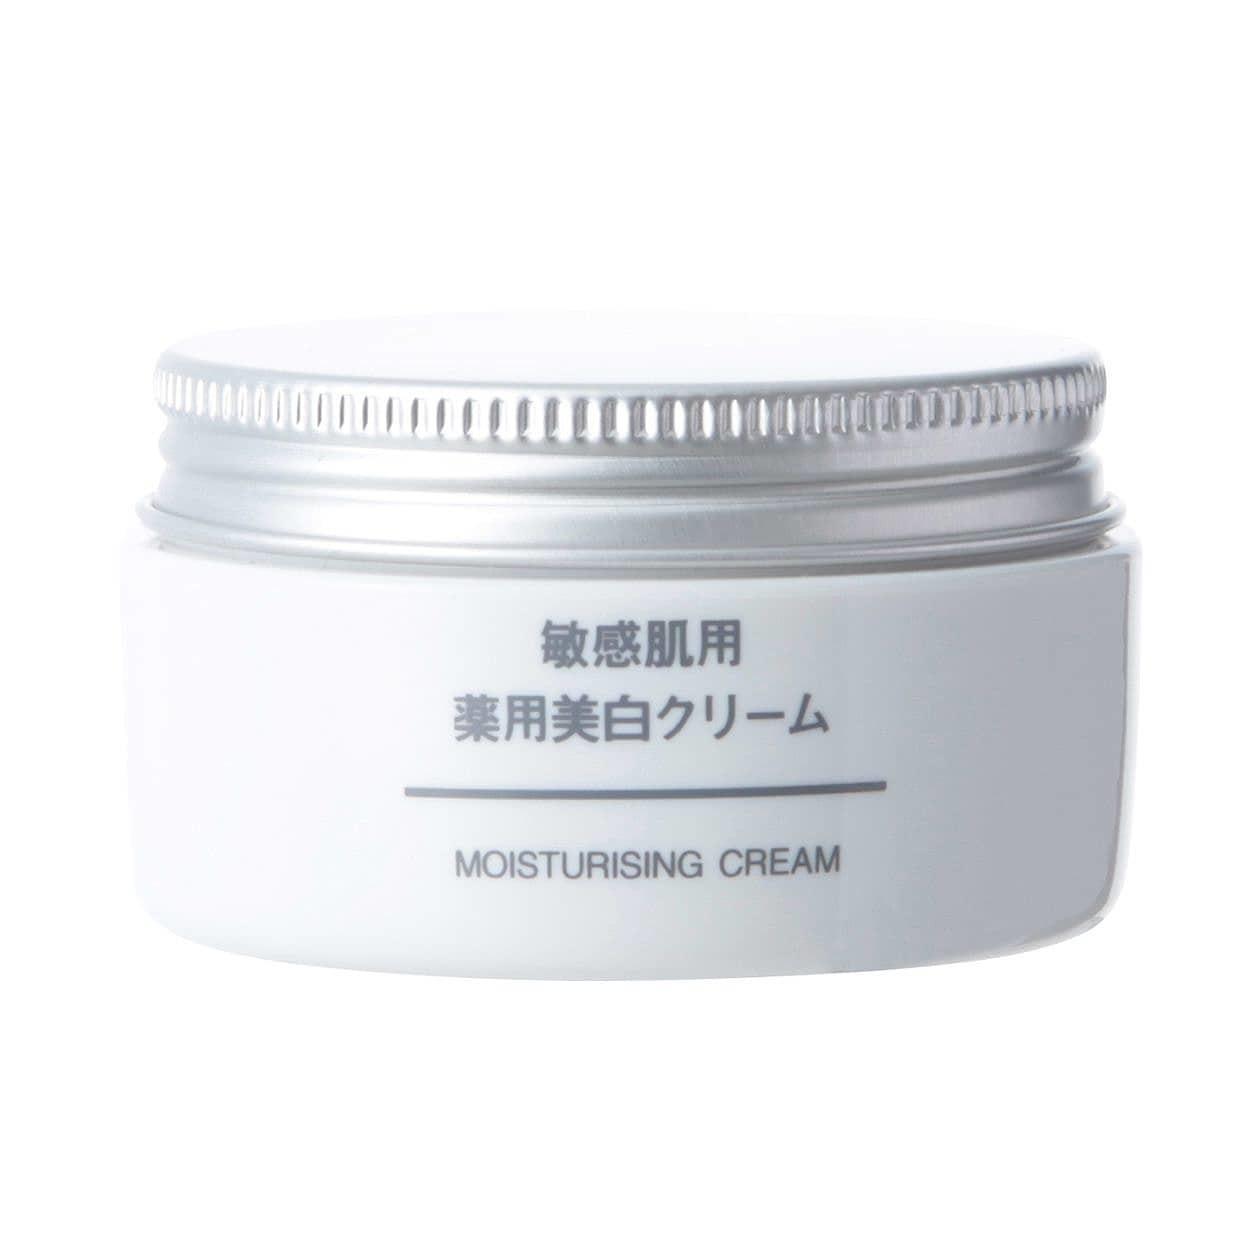 MUJI(無印良品) 敏感肌用薬用美白クリーム